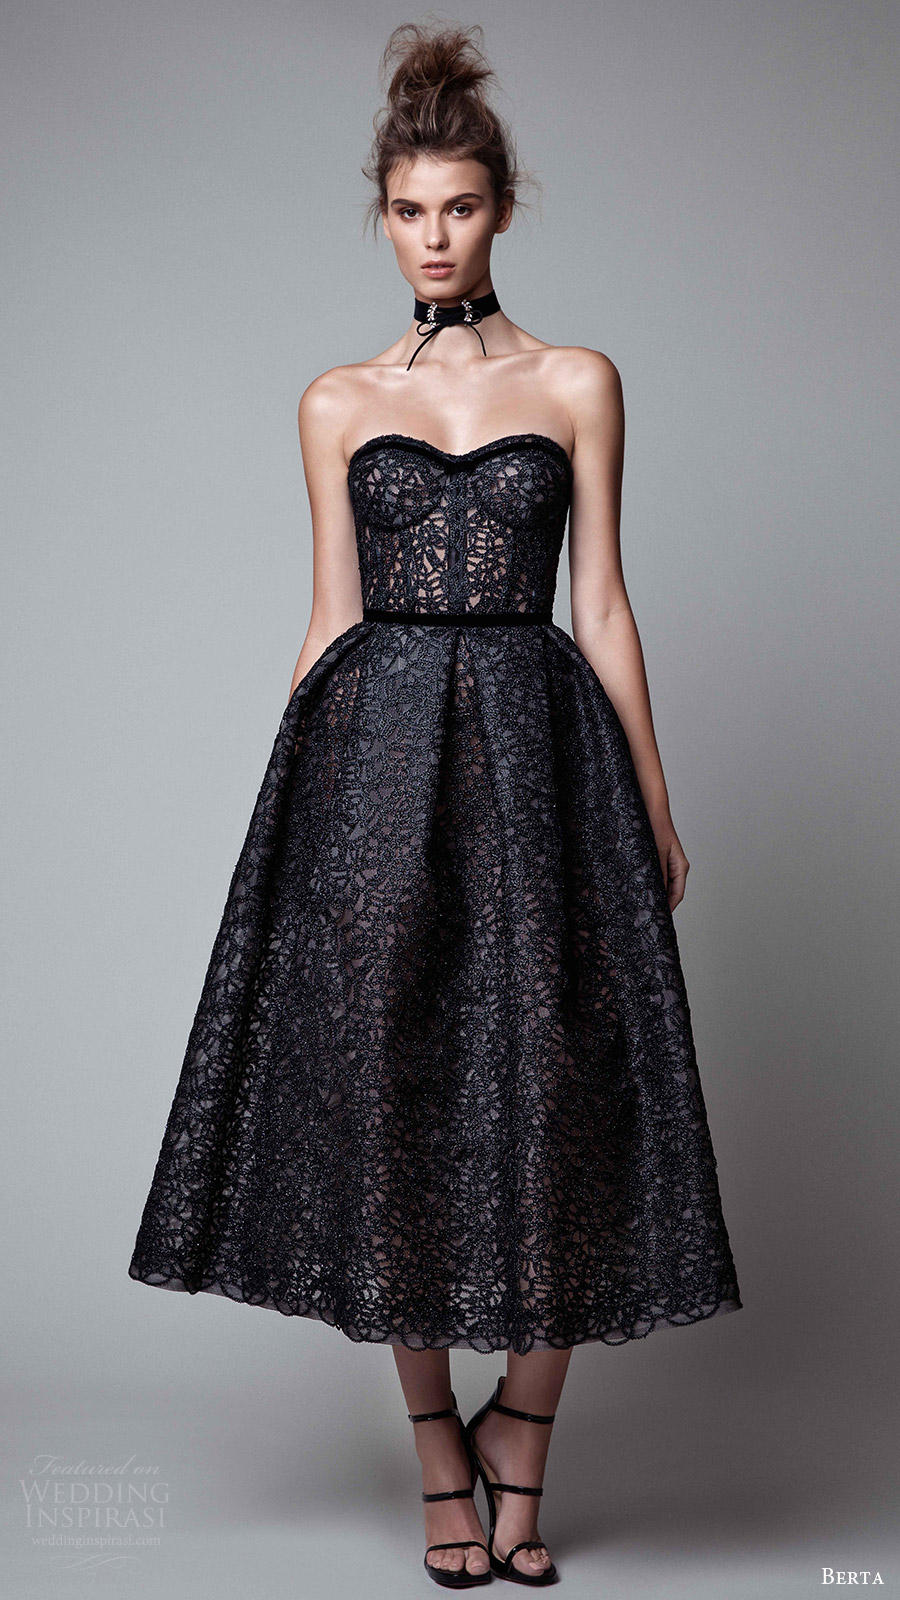 berta rtw fall 2017 (17 33) strapless sweetheart tea length ball gown evening dress mv black